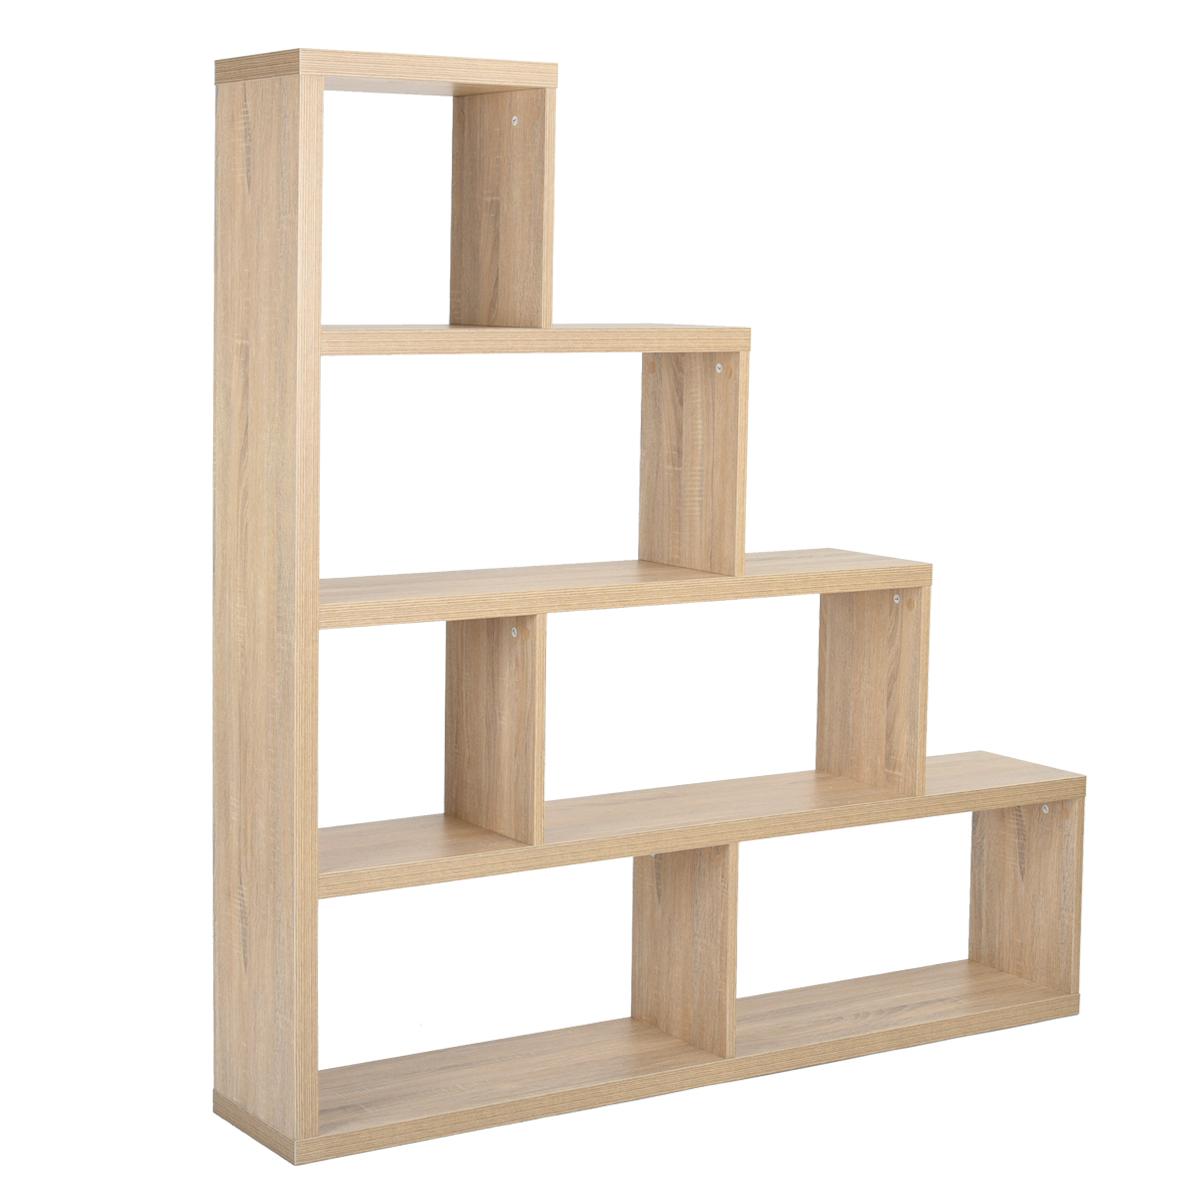 etag re escalier biblioth que rangement 4 tages design m lamin ch ne clair ebay. Black Bedroom Furniture Sets. Home Design Ideas